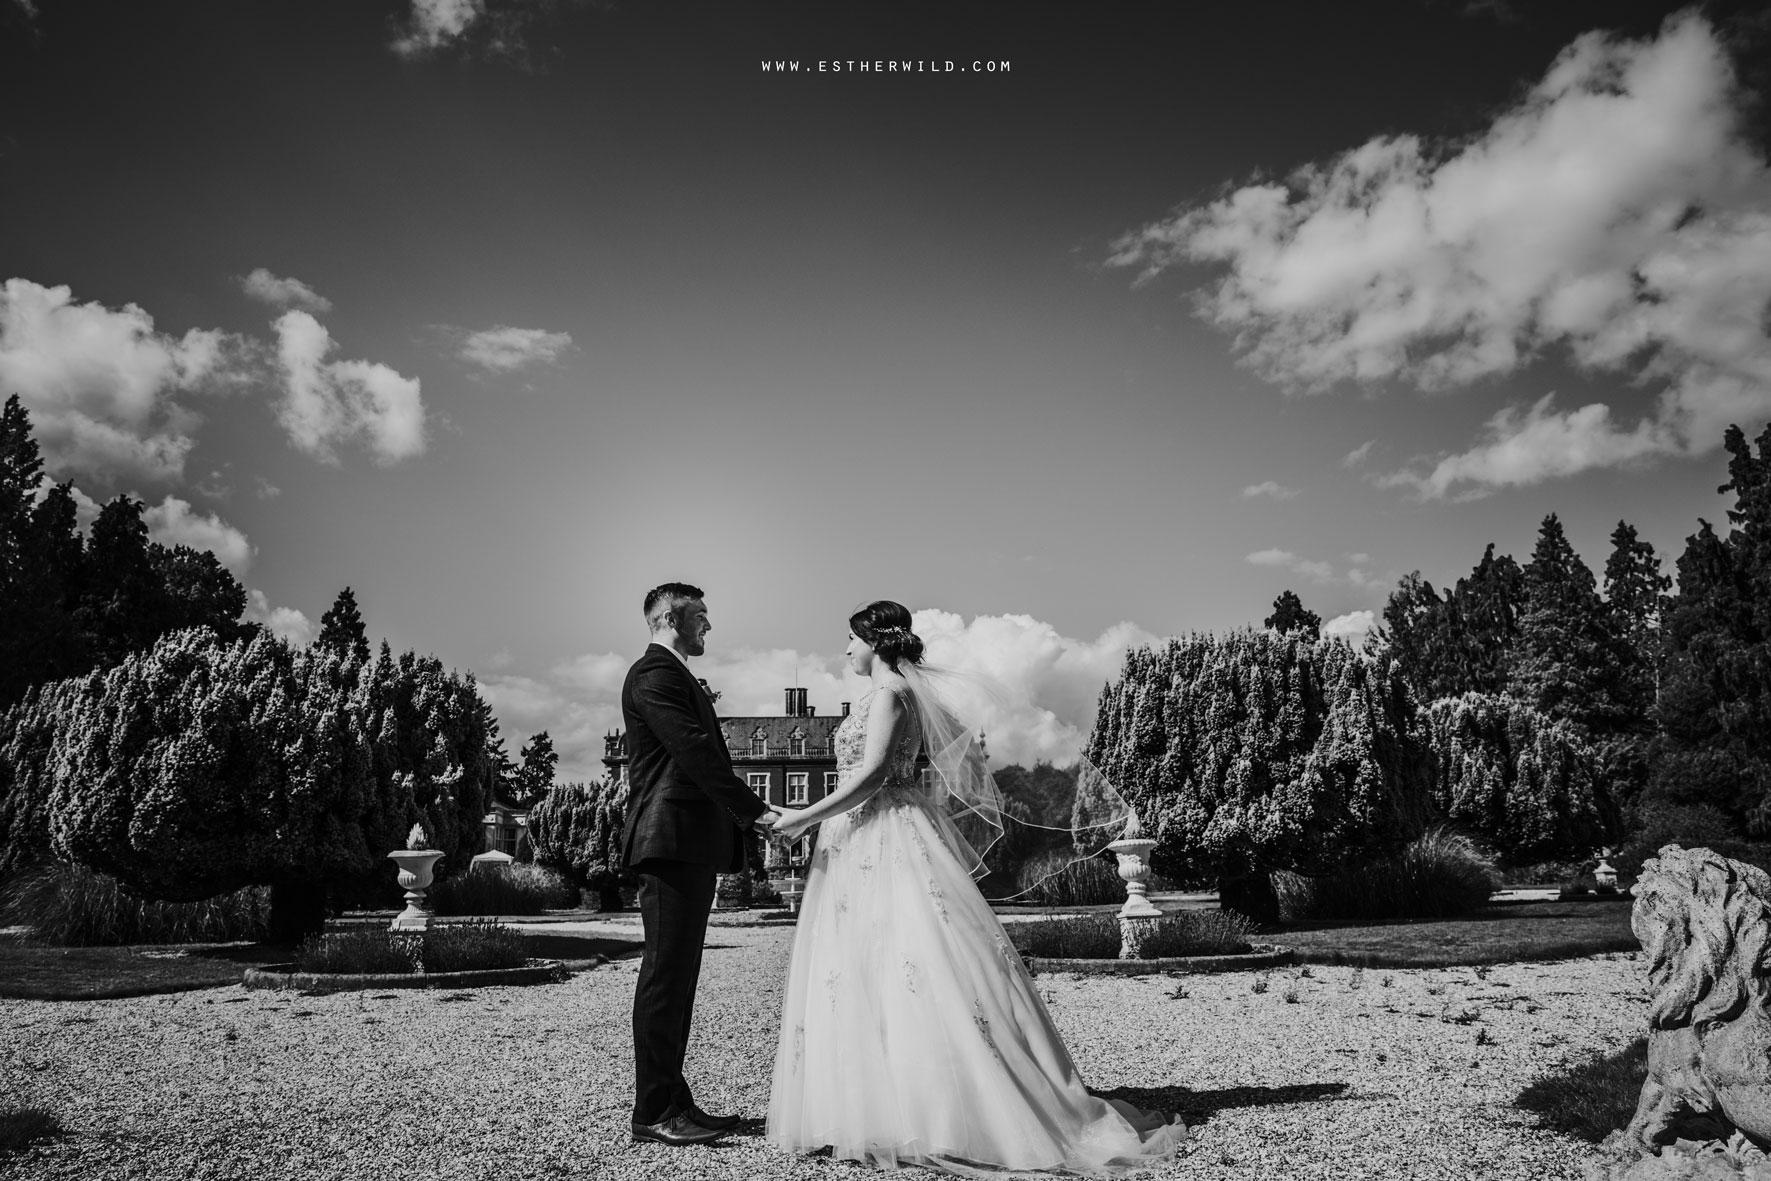 Lynford_Hall_Wedding_Thetford_Mundford_Esther_Wild_Photographer_IMG_1718.jpg